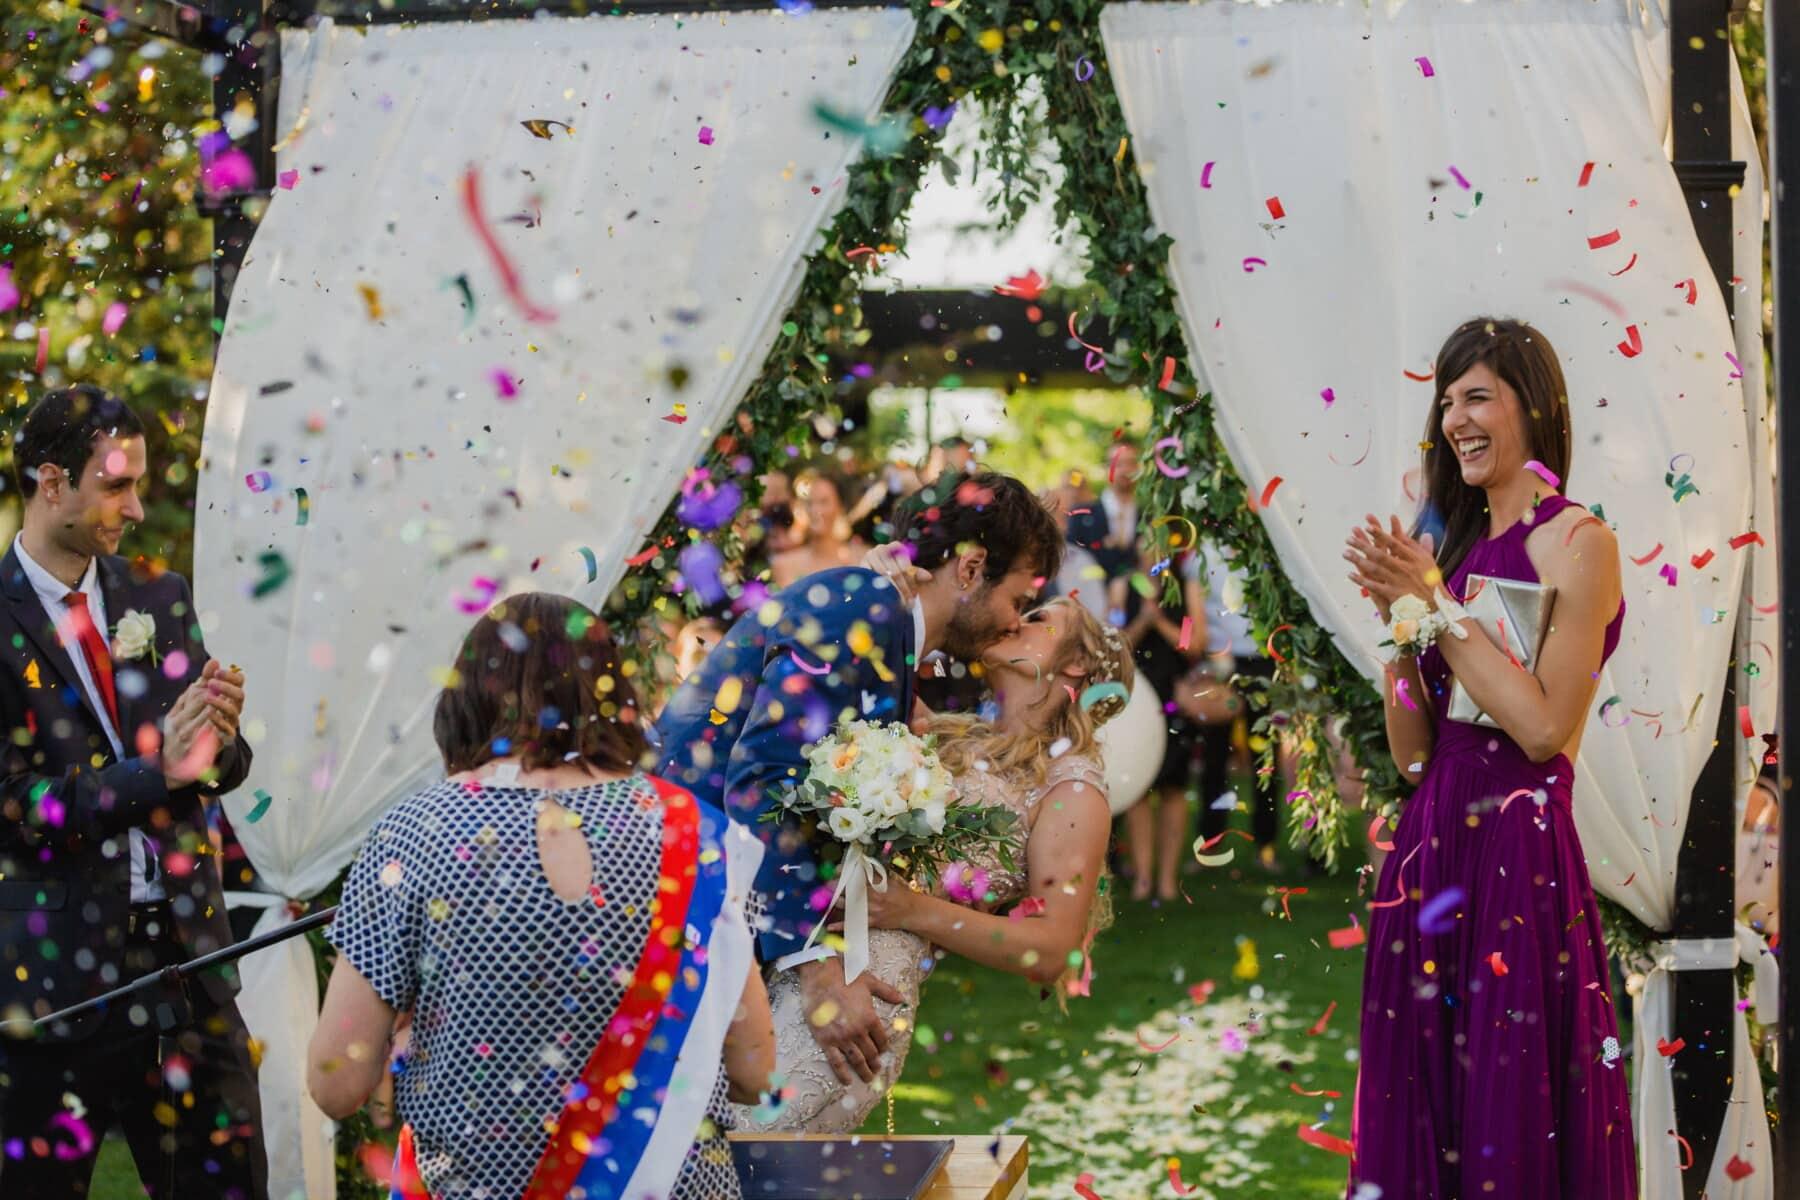 kiss, wedding, wedding venue, spectacular, crowd, audience, applause, spectator, groom, bride